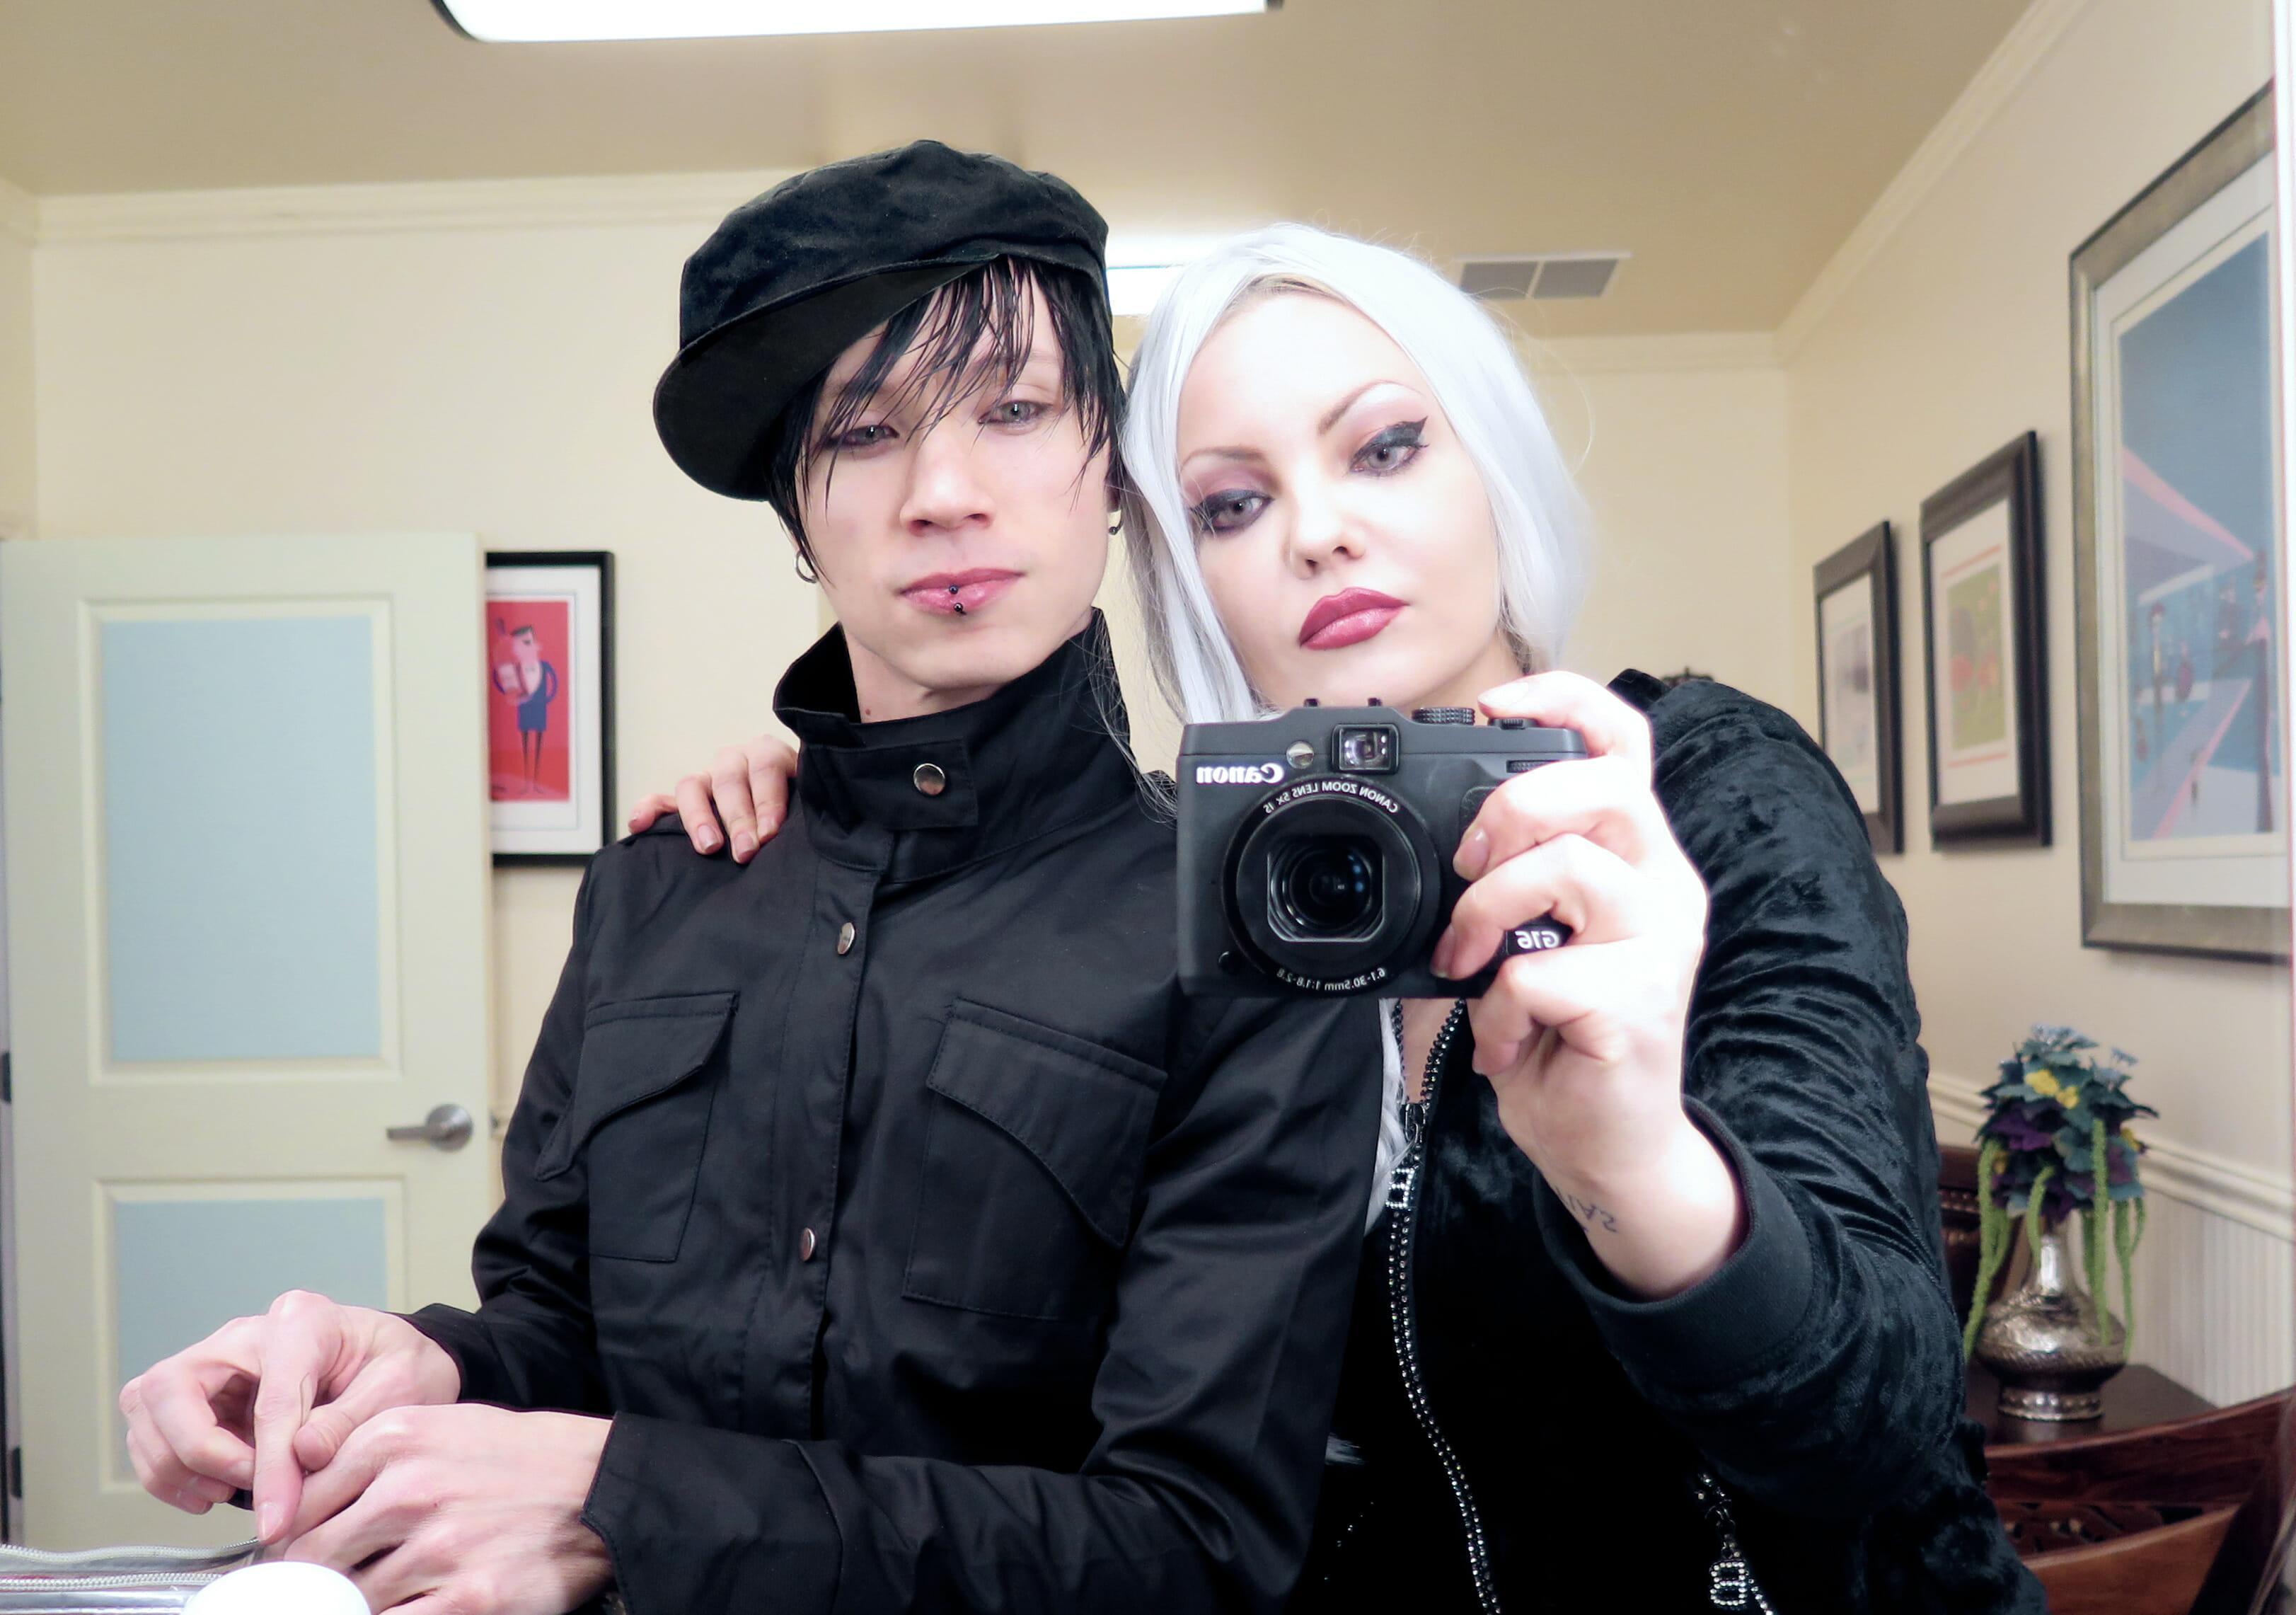 Patrick & Elena Behind the Scenes